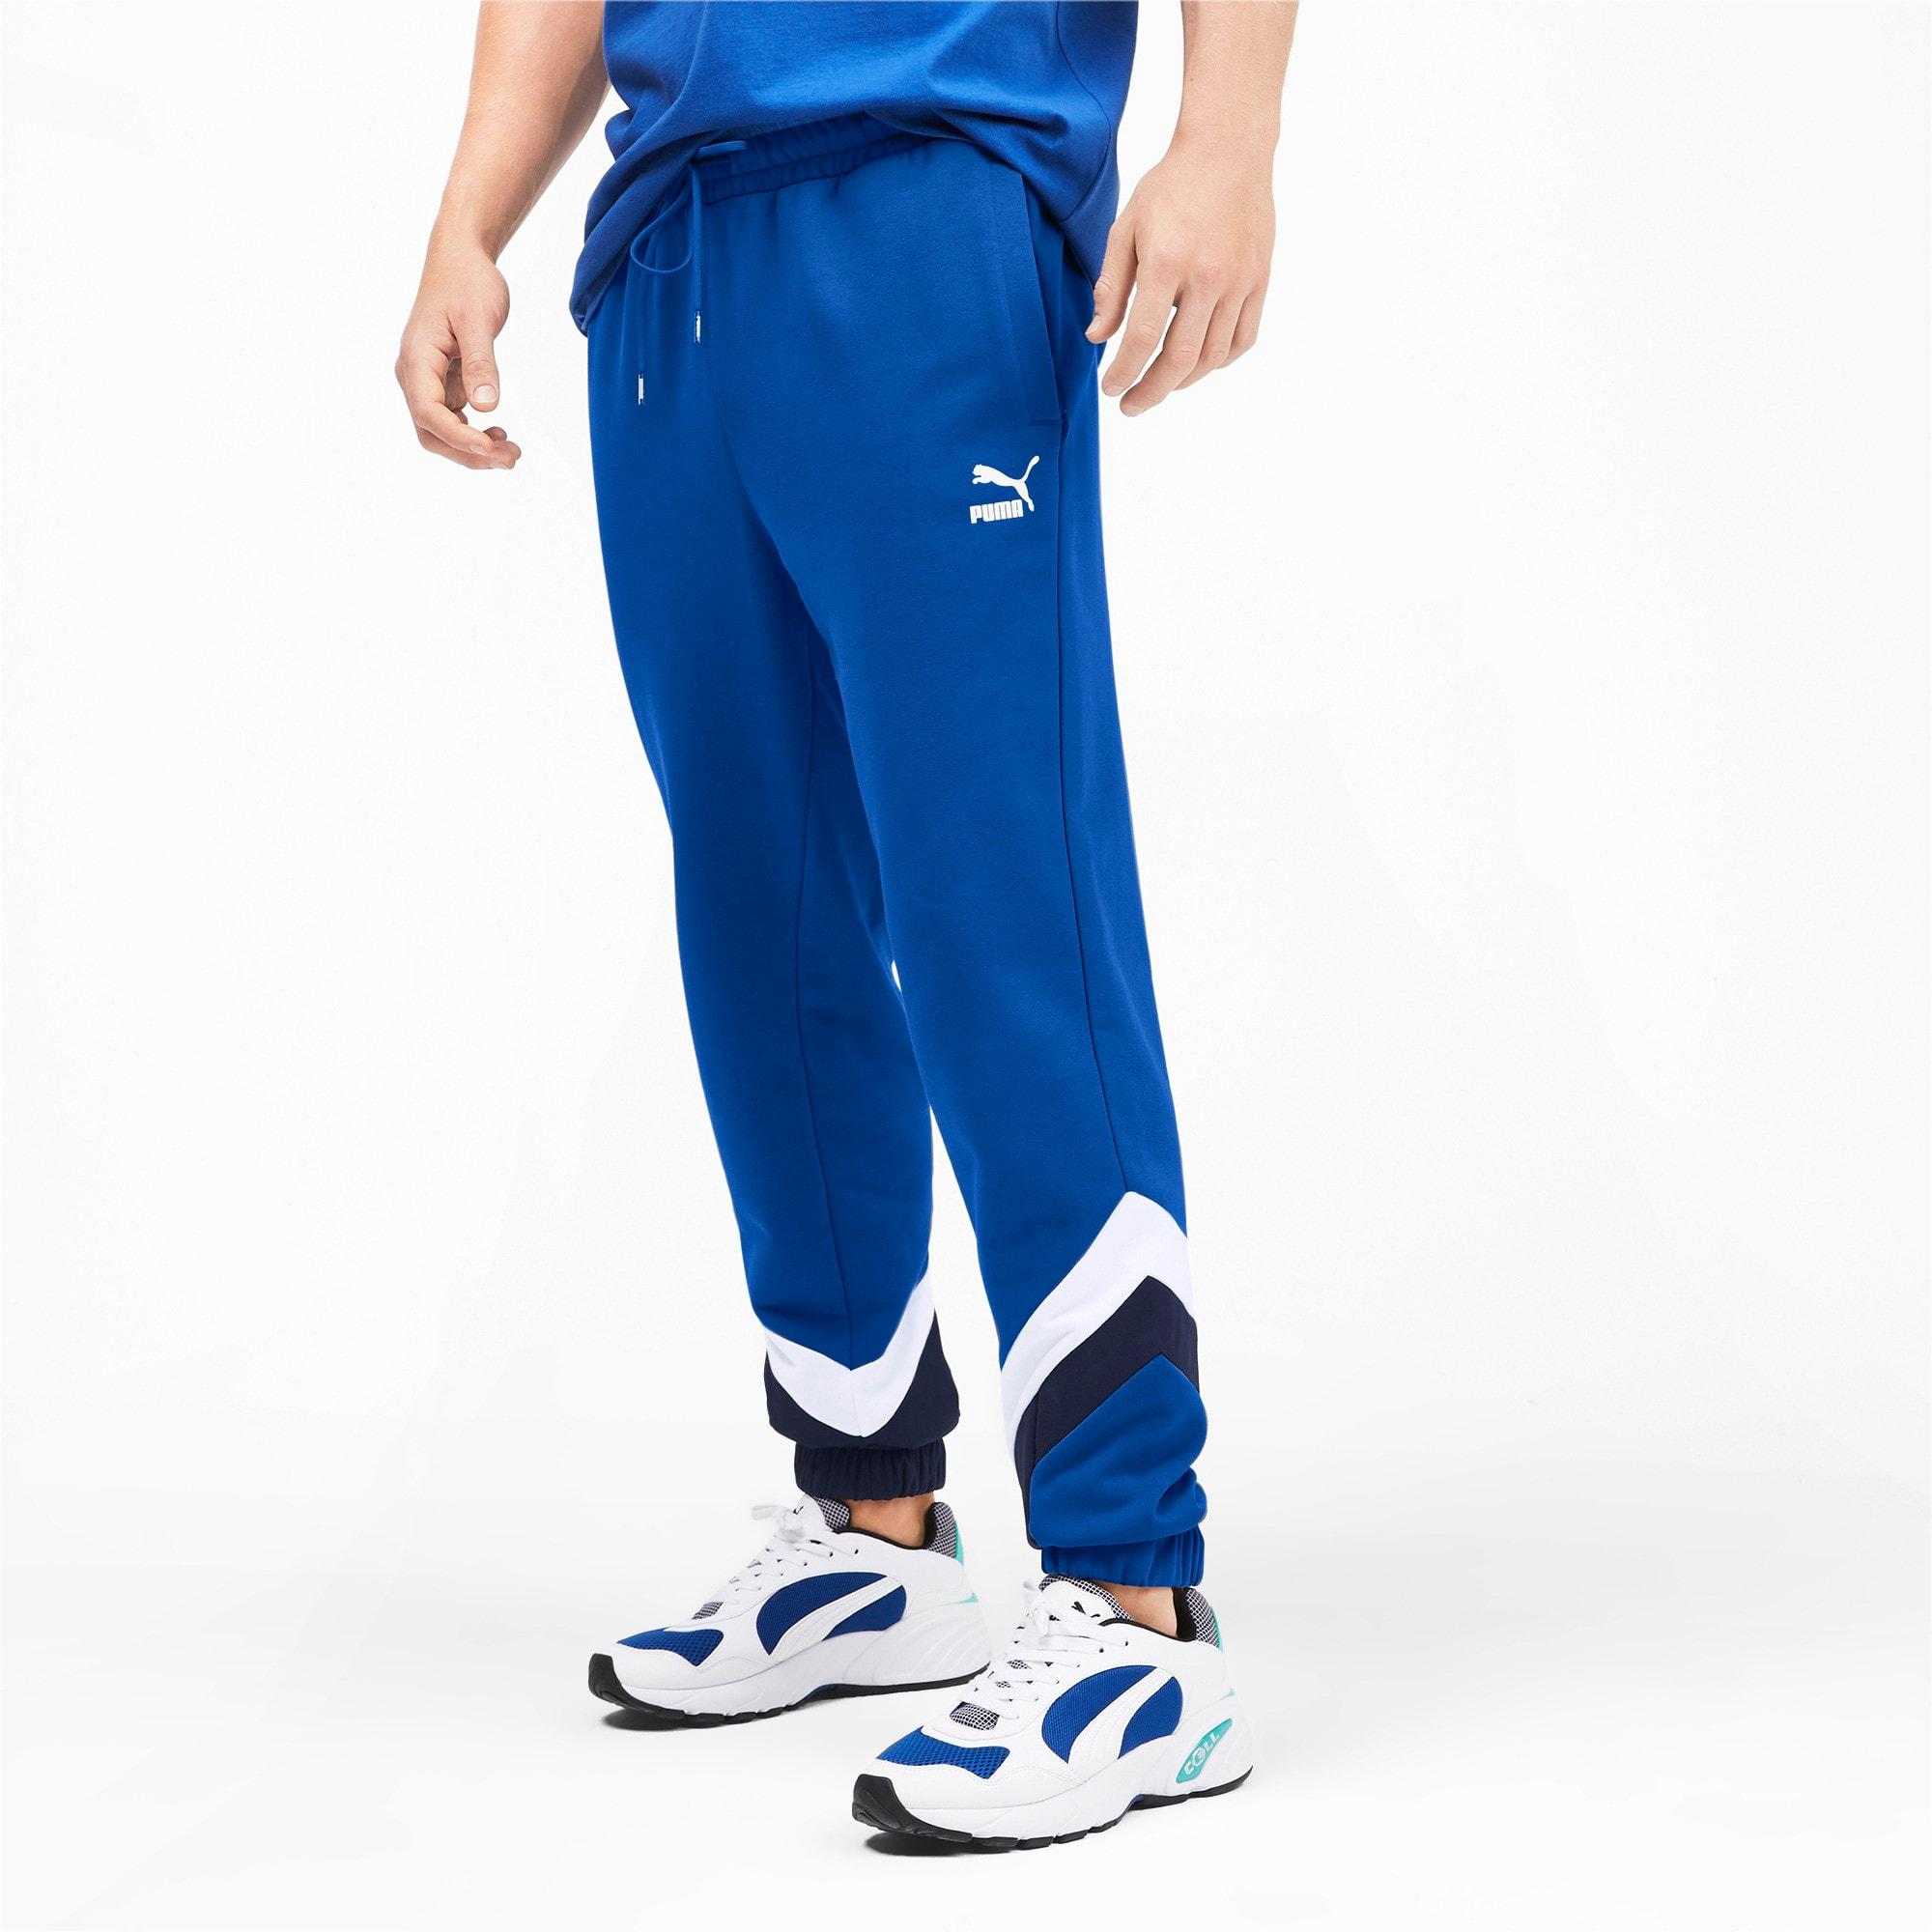 Thumbnail 2 of Iconic MCS Men's Track Pants, Galaxy Blue, medium